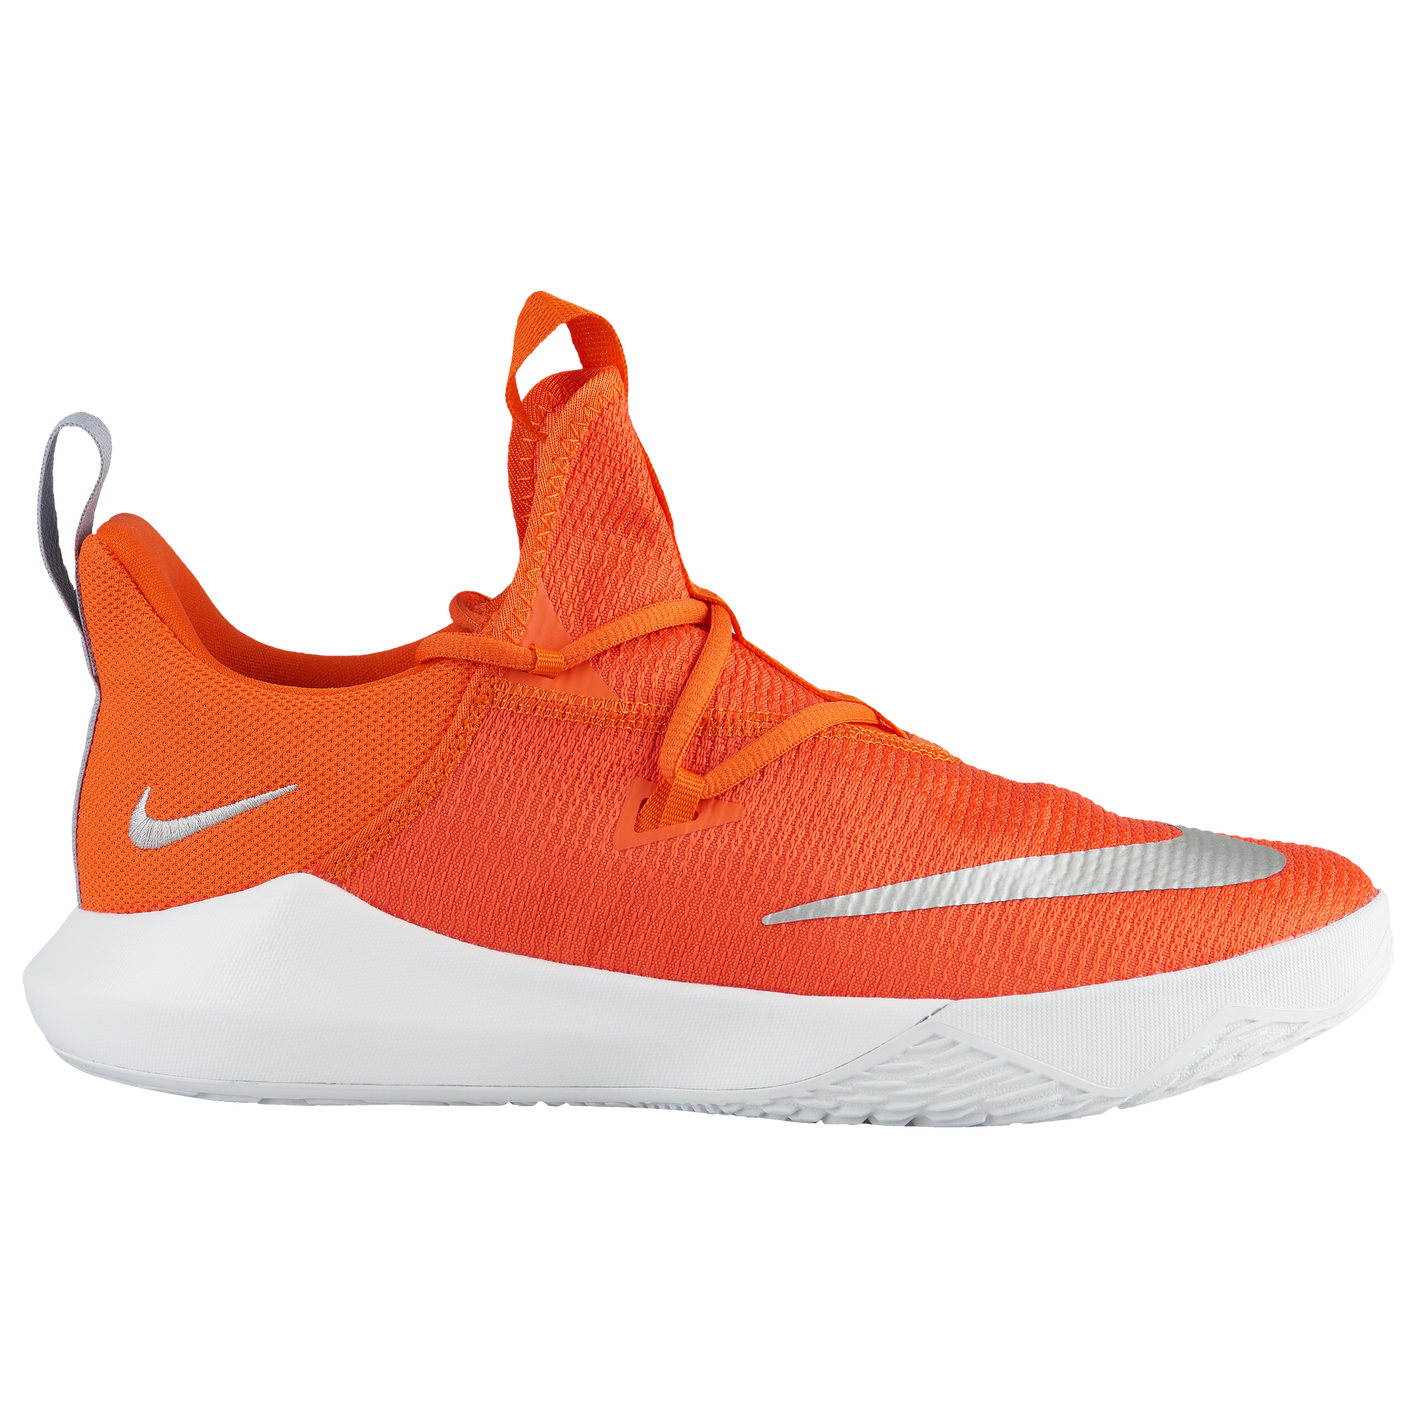 e8cbd7596a1 Nike Zoom Shift 2 - Men s - Basketball - Shoes - Brilliant Orange ...